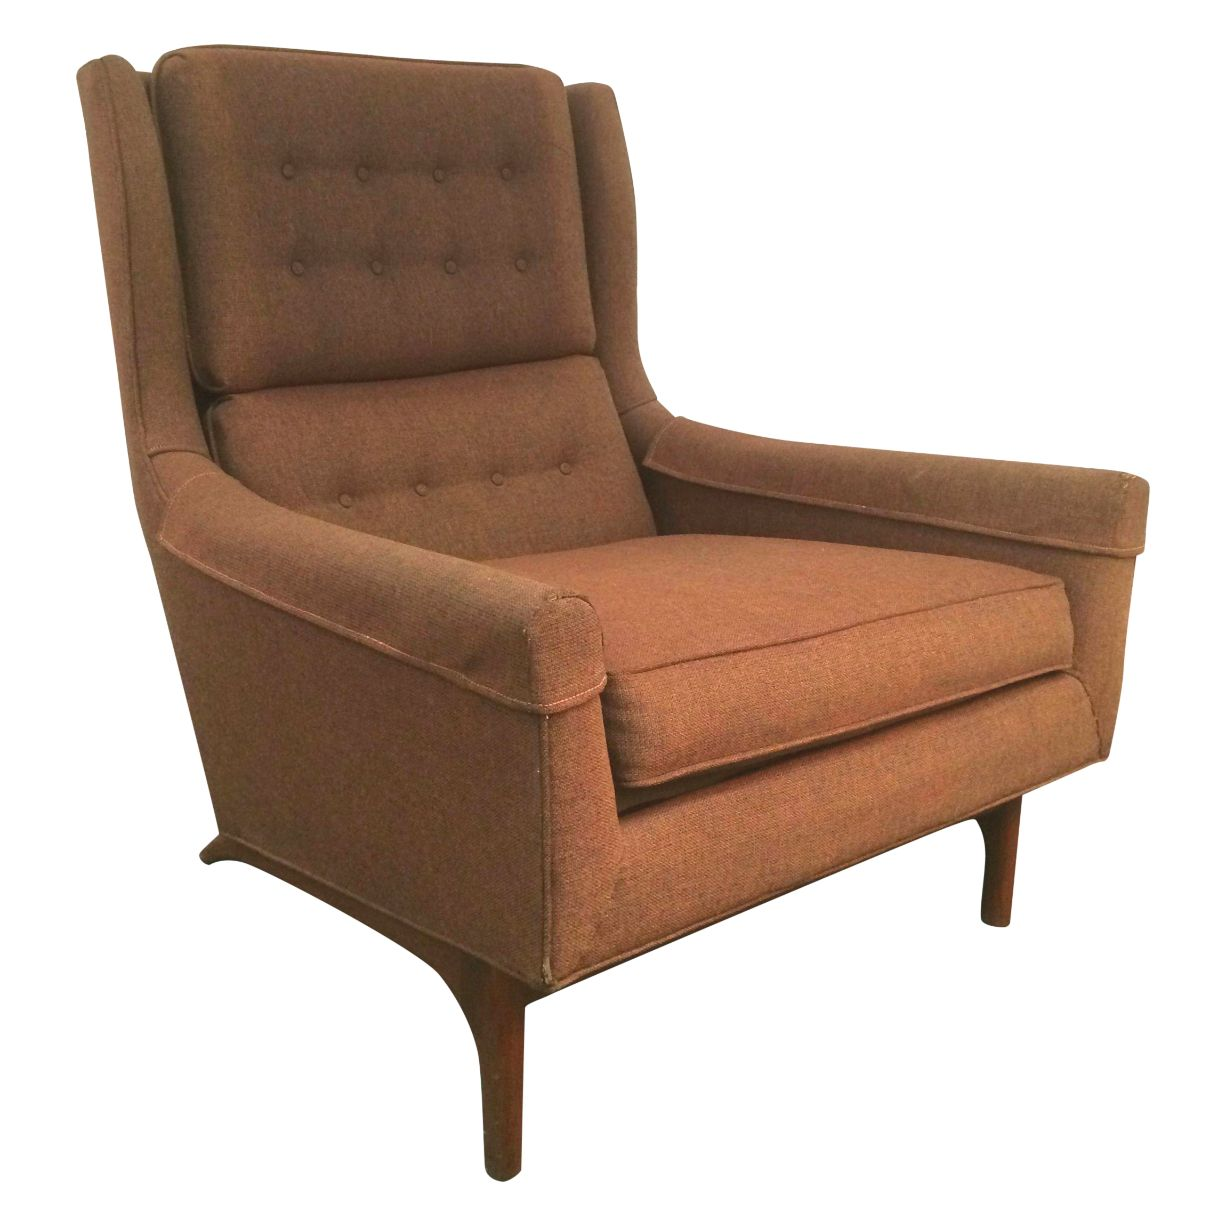 Danish modern wingback chair - Image Of Vintage Goebel Woodworks Danish Modern Wing Chair